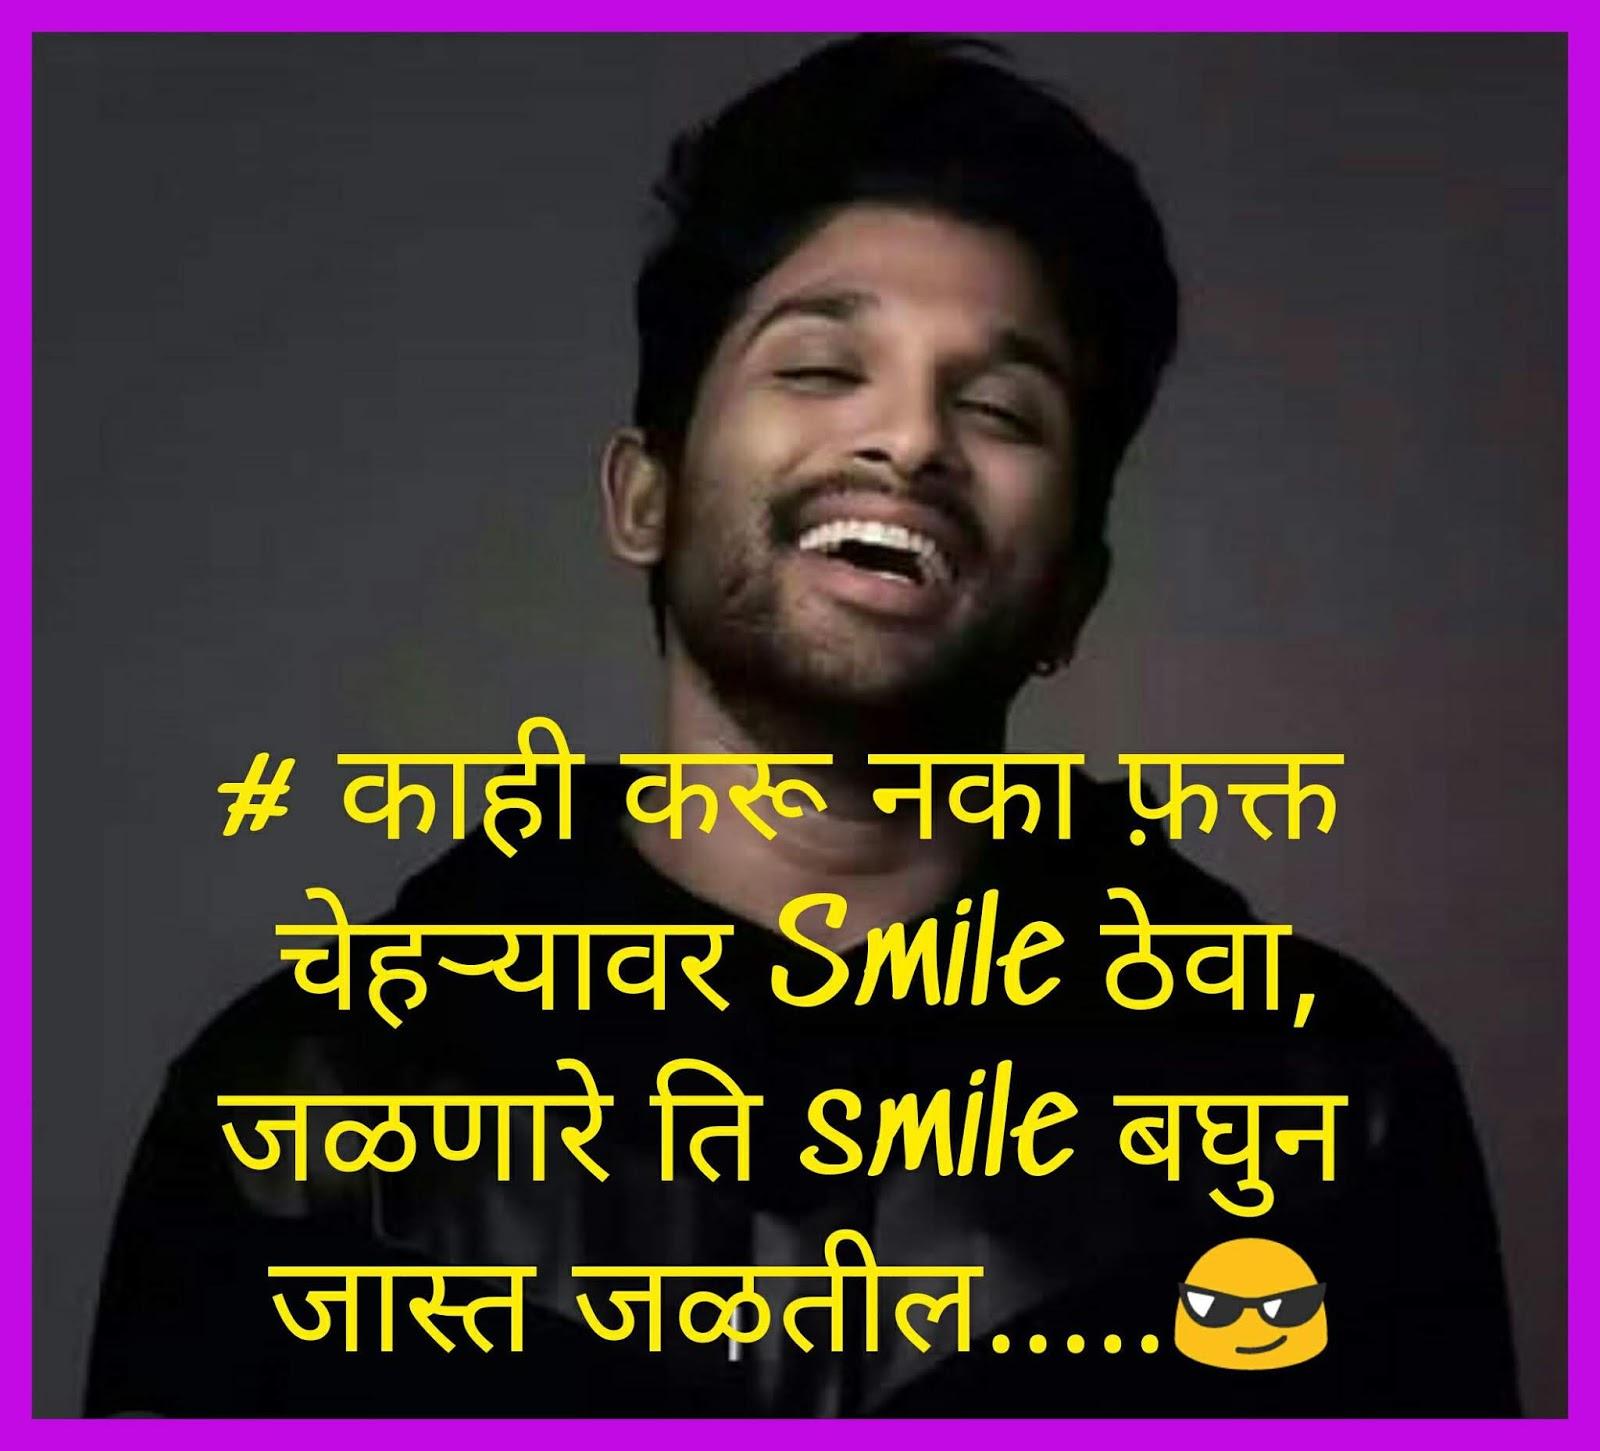 100+Marathi Attitude Status || Marathi Status